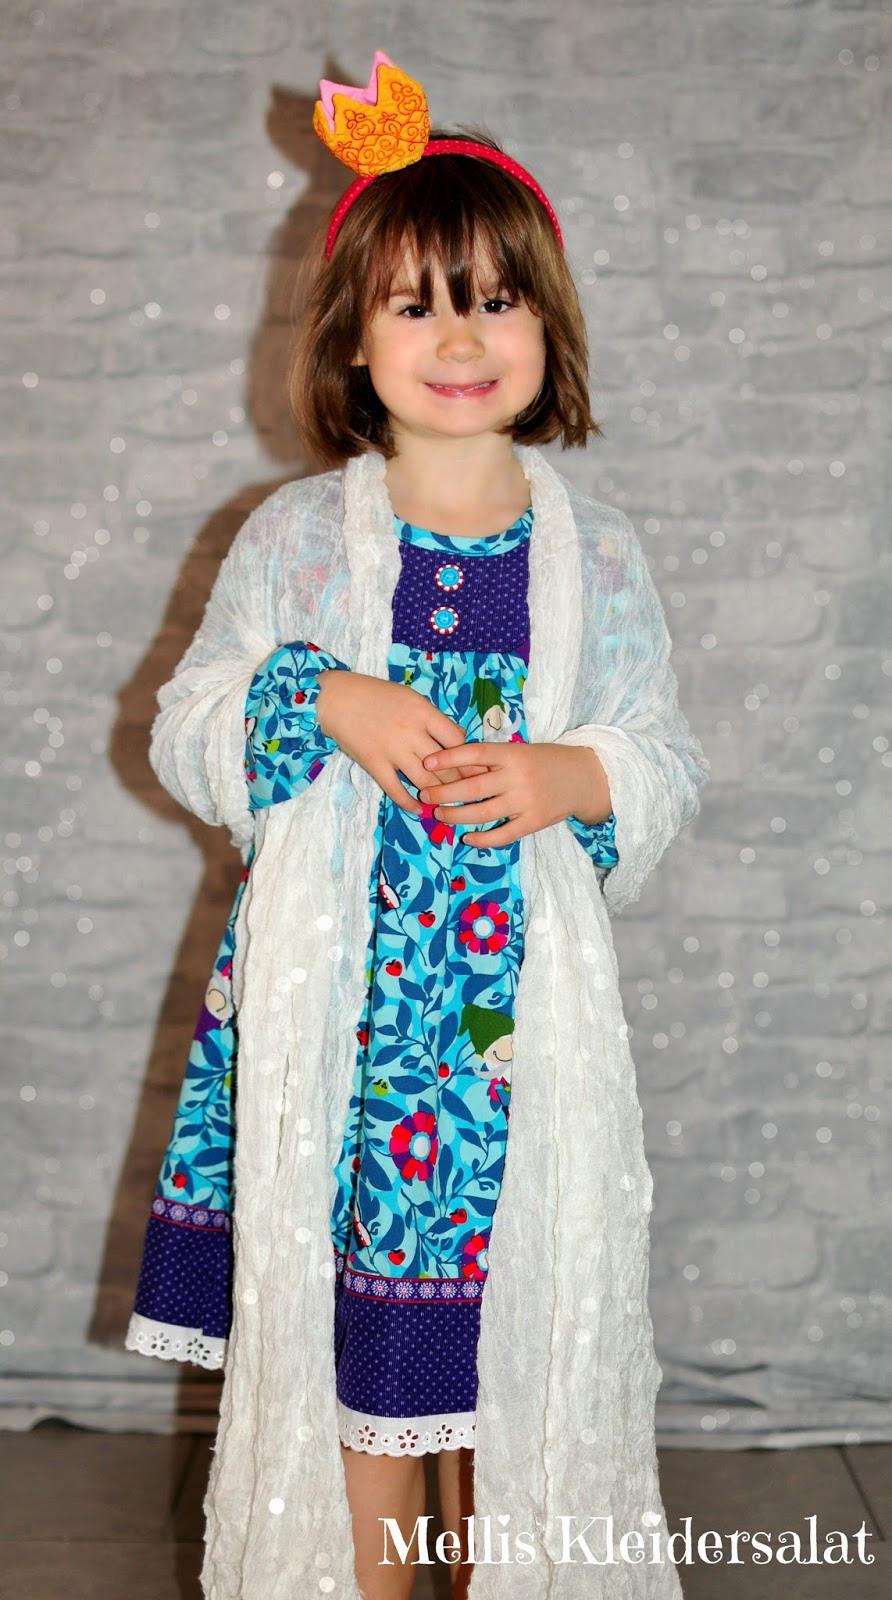 Mellis Kleidersalat Geburtstagskleid